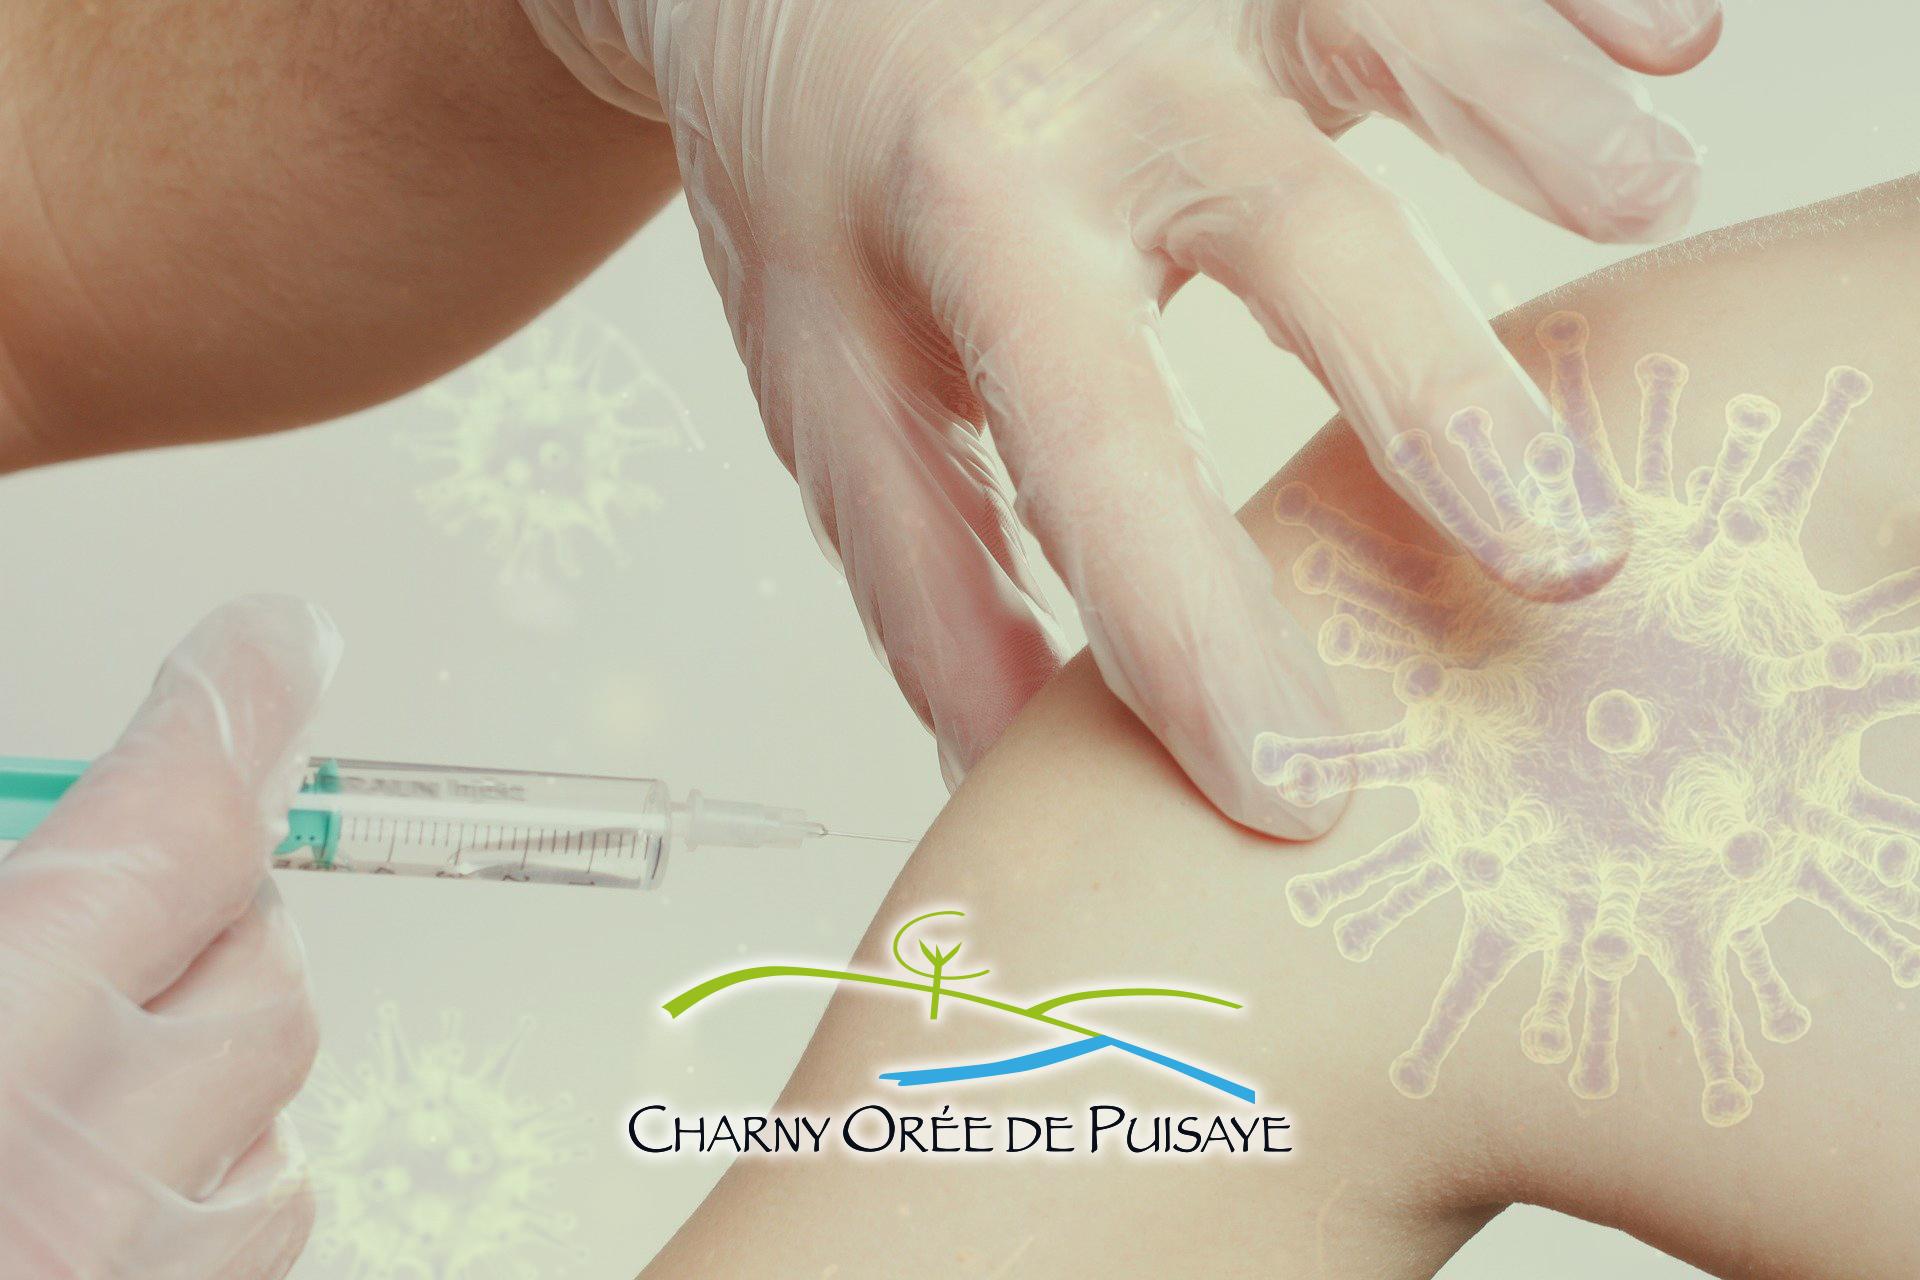 Vaccination Covid19 Charny Orée de Puisaye